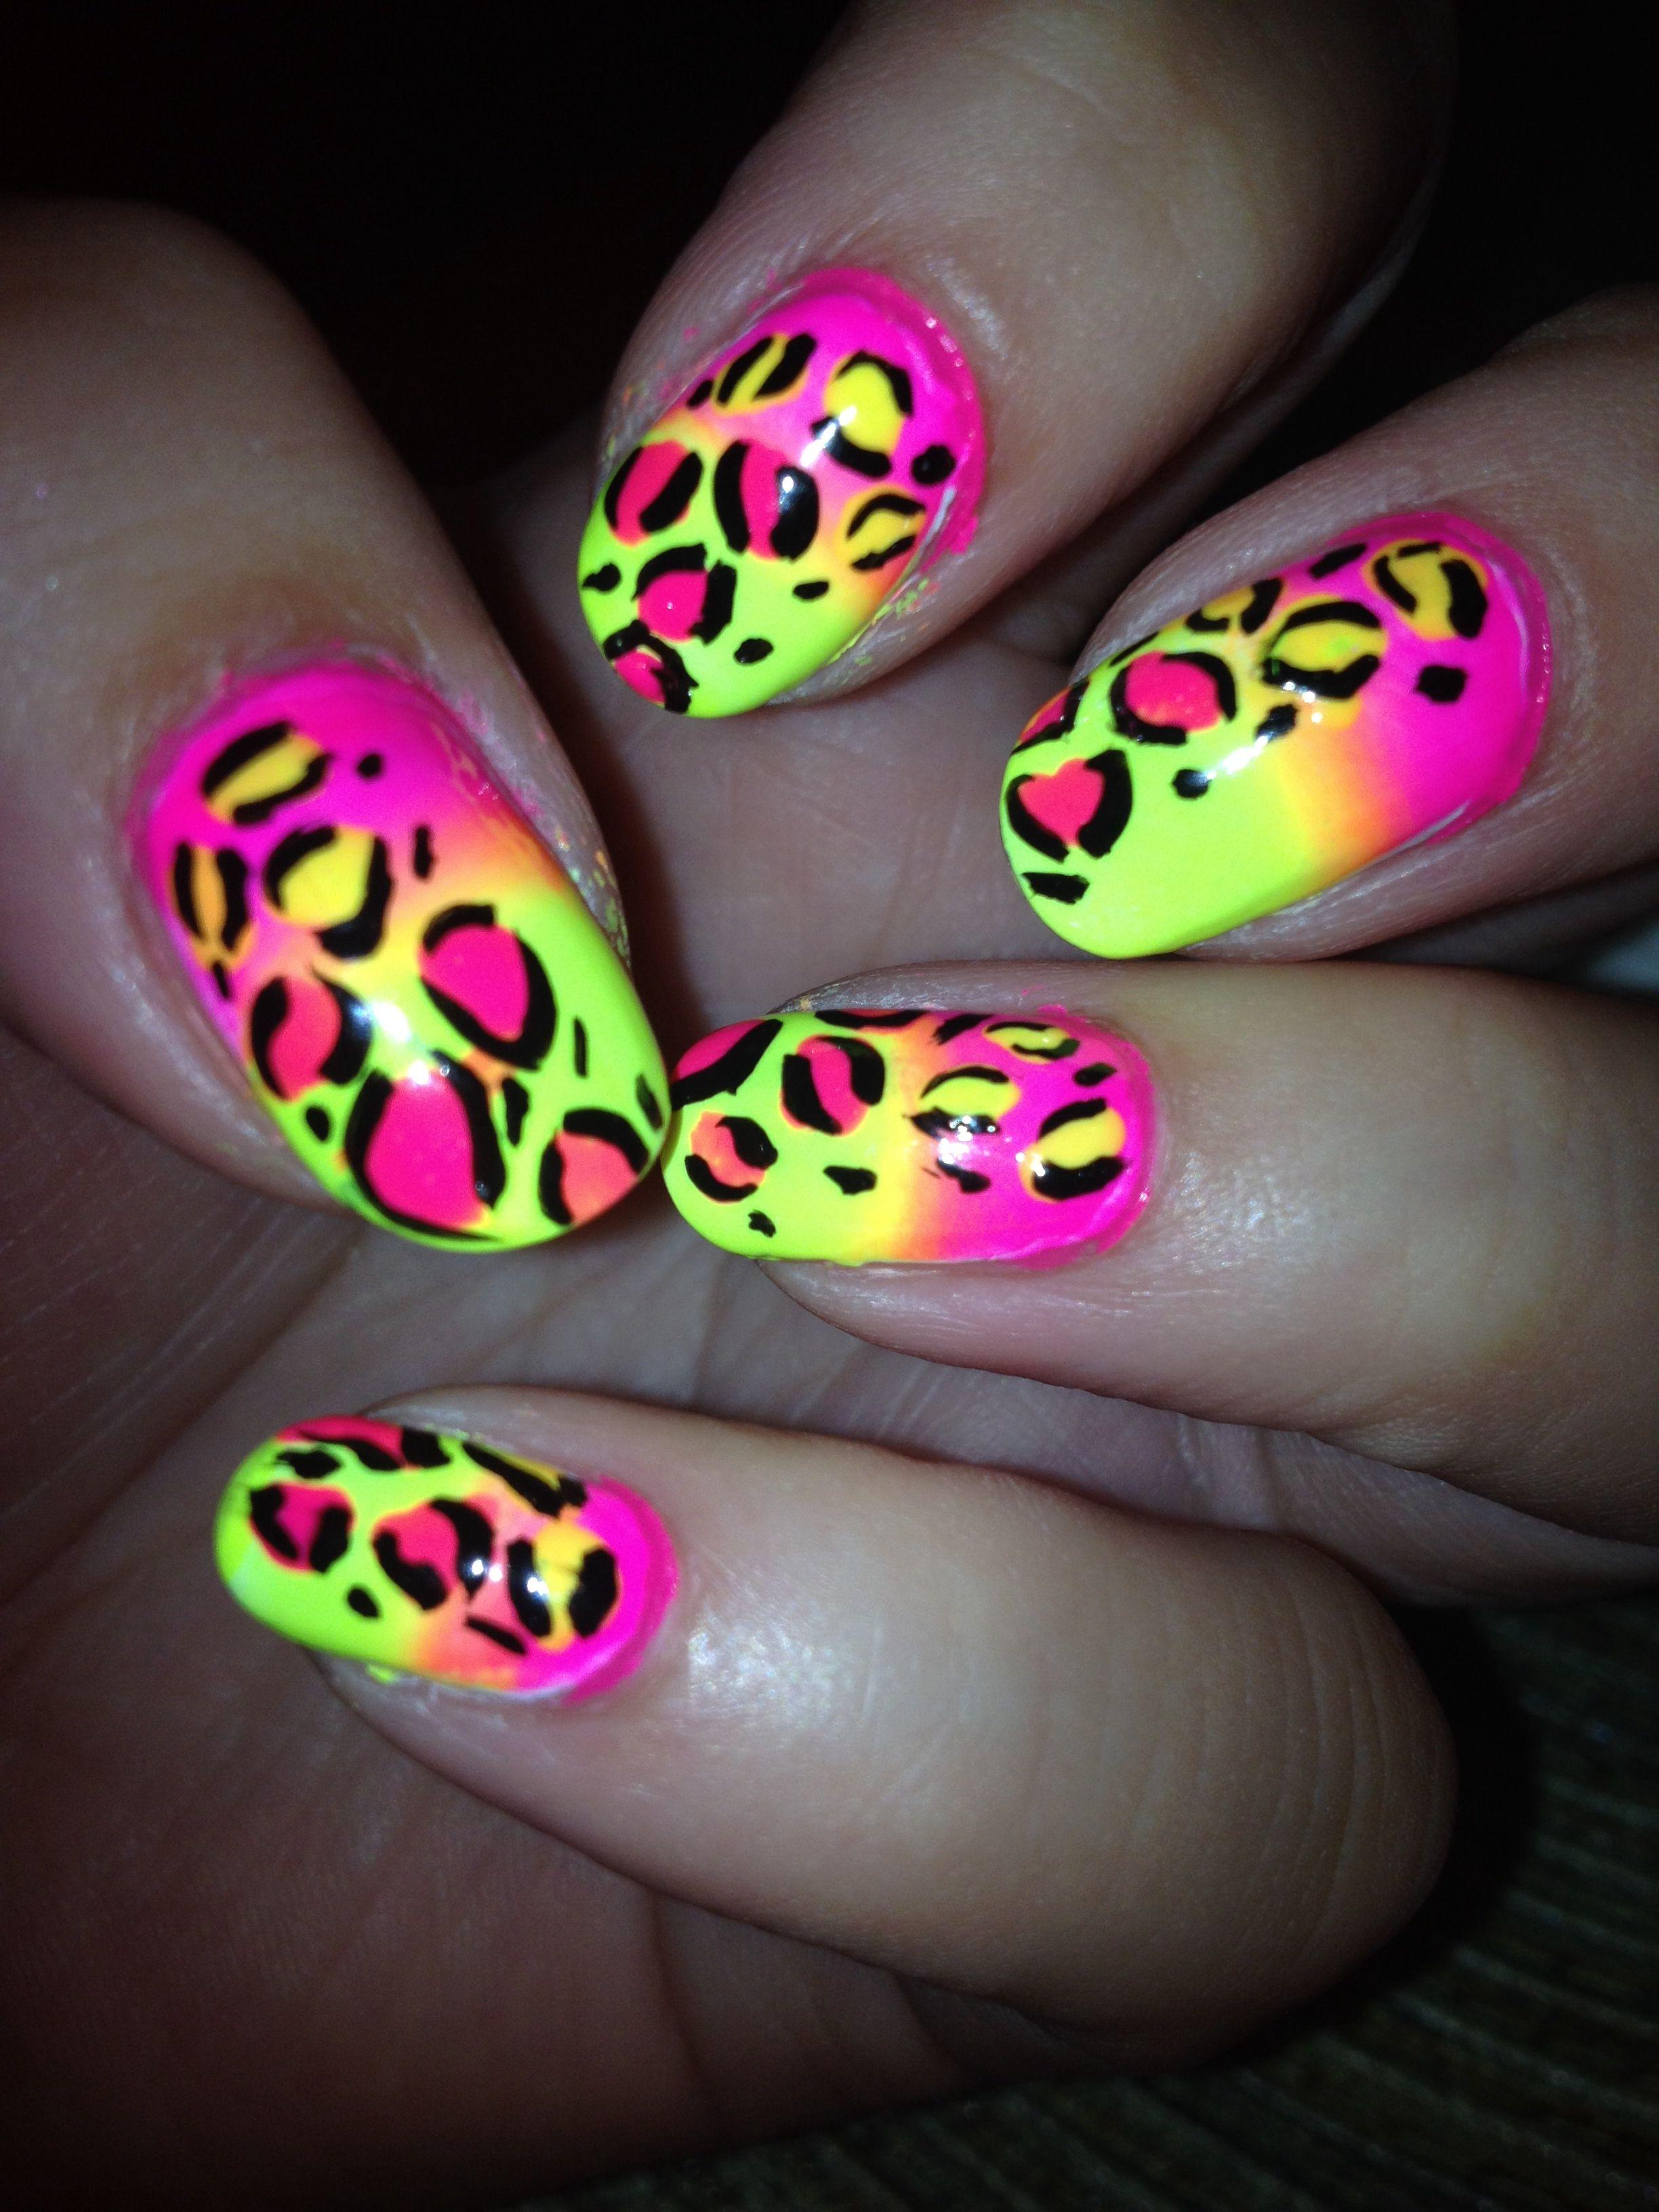 Katy perry nails ;)   My nail art   Pinterest   Katy perry, Neon ...